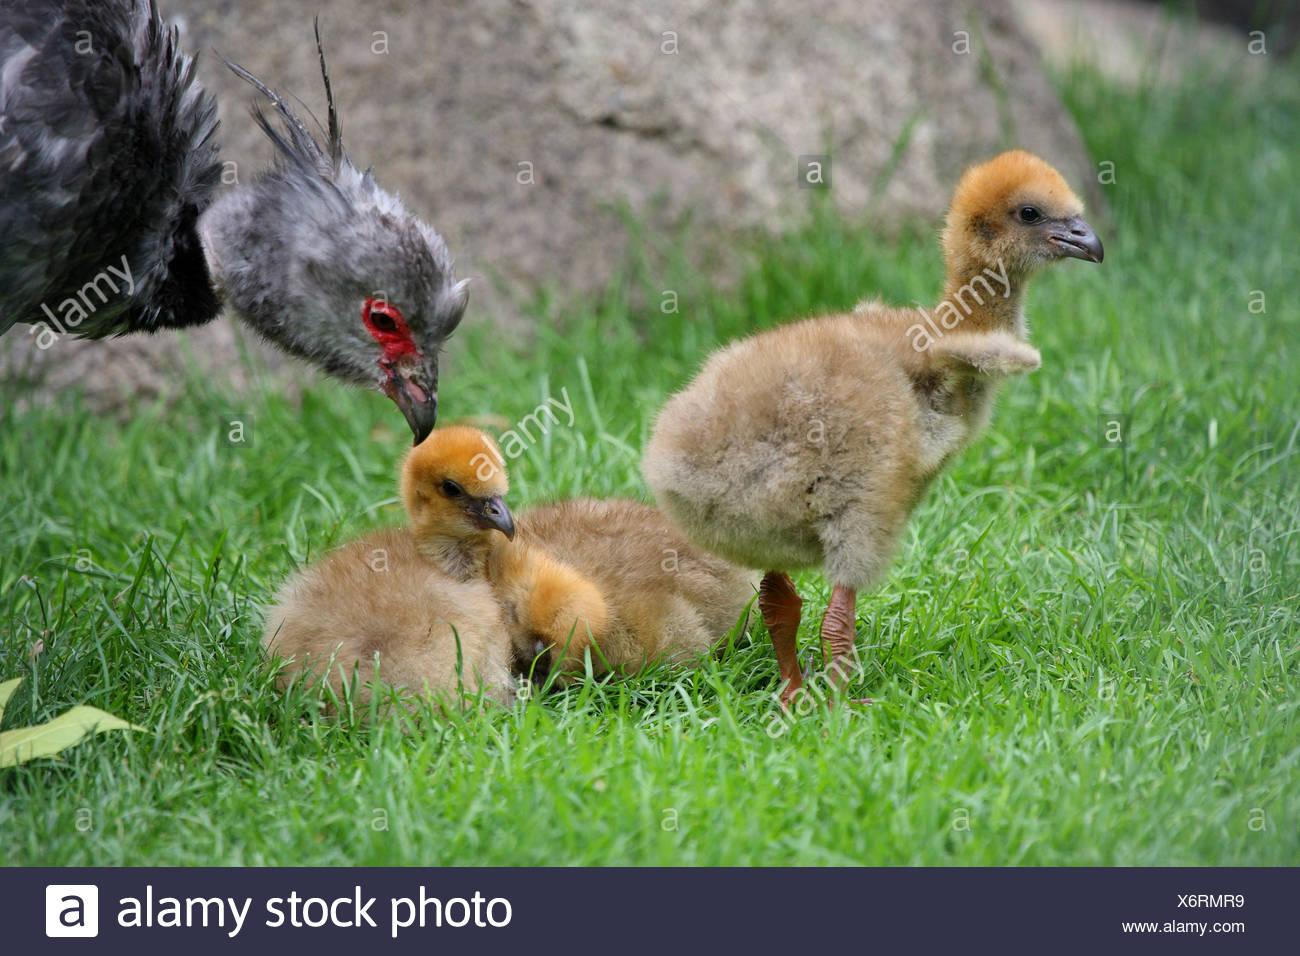 crested screamer (Chauna torquata), chicks with adult - Stock Image